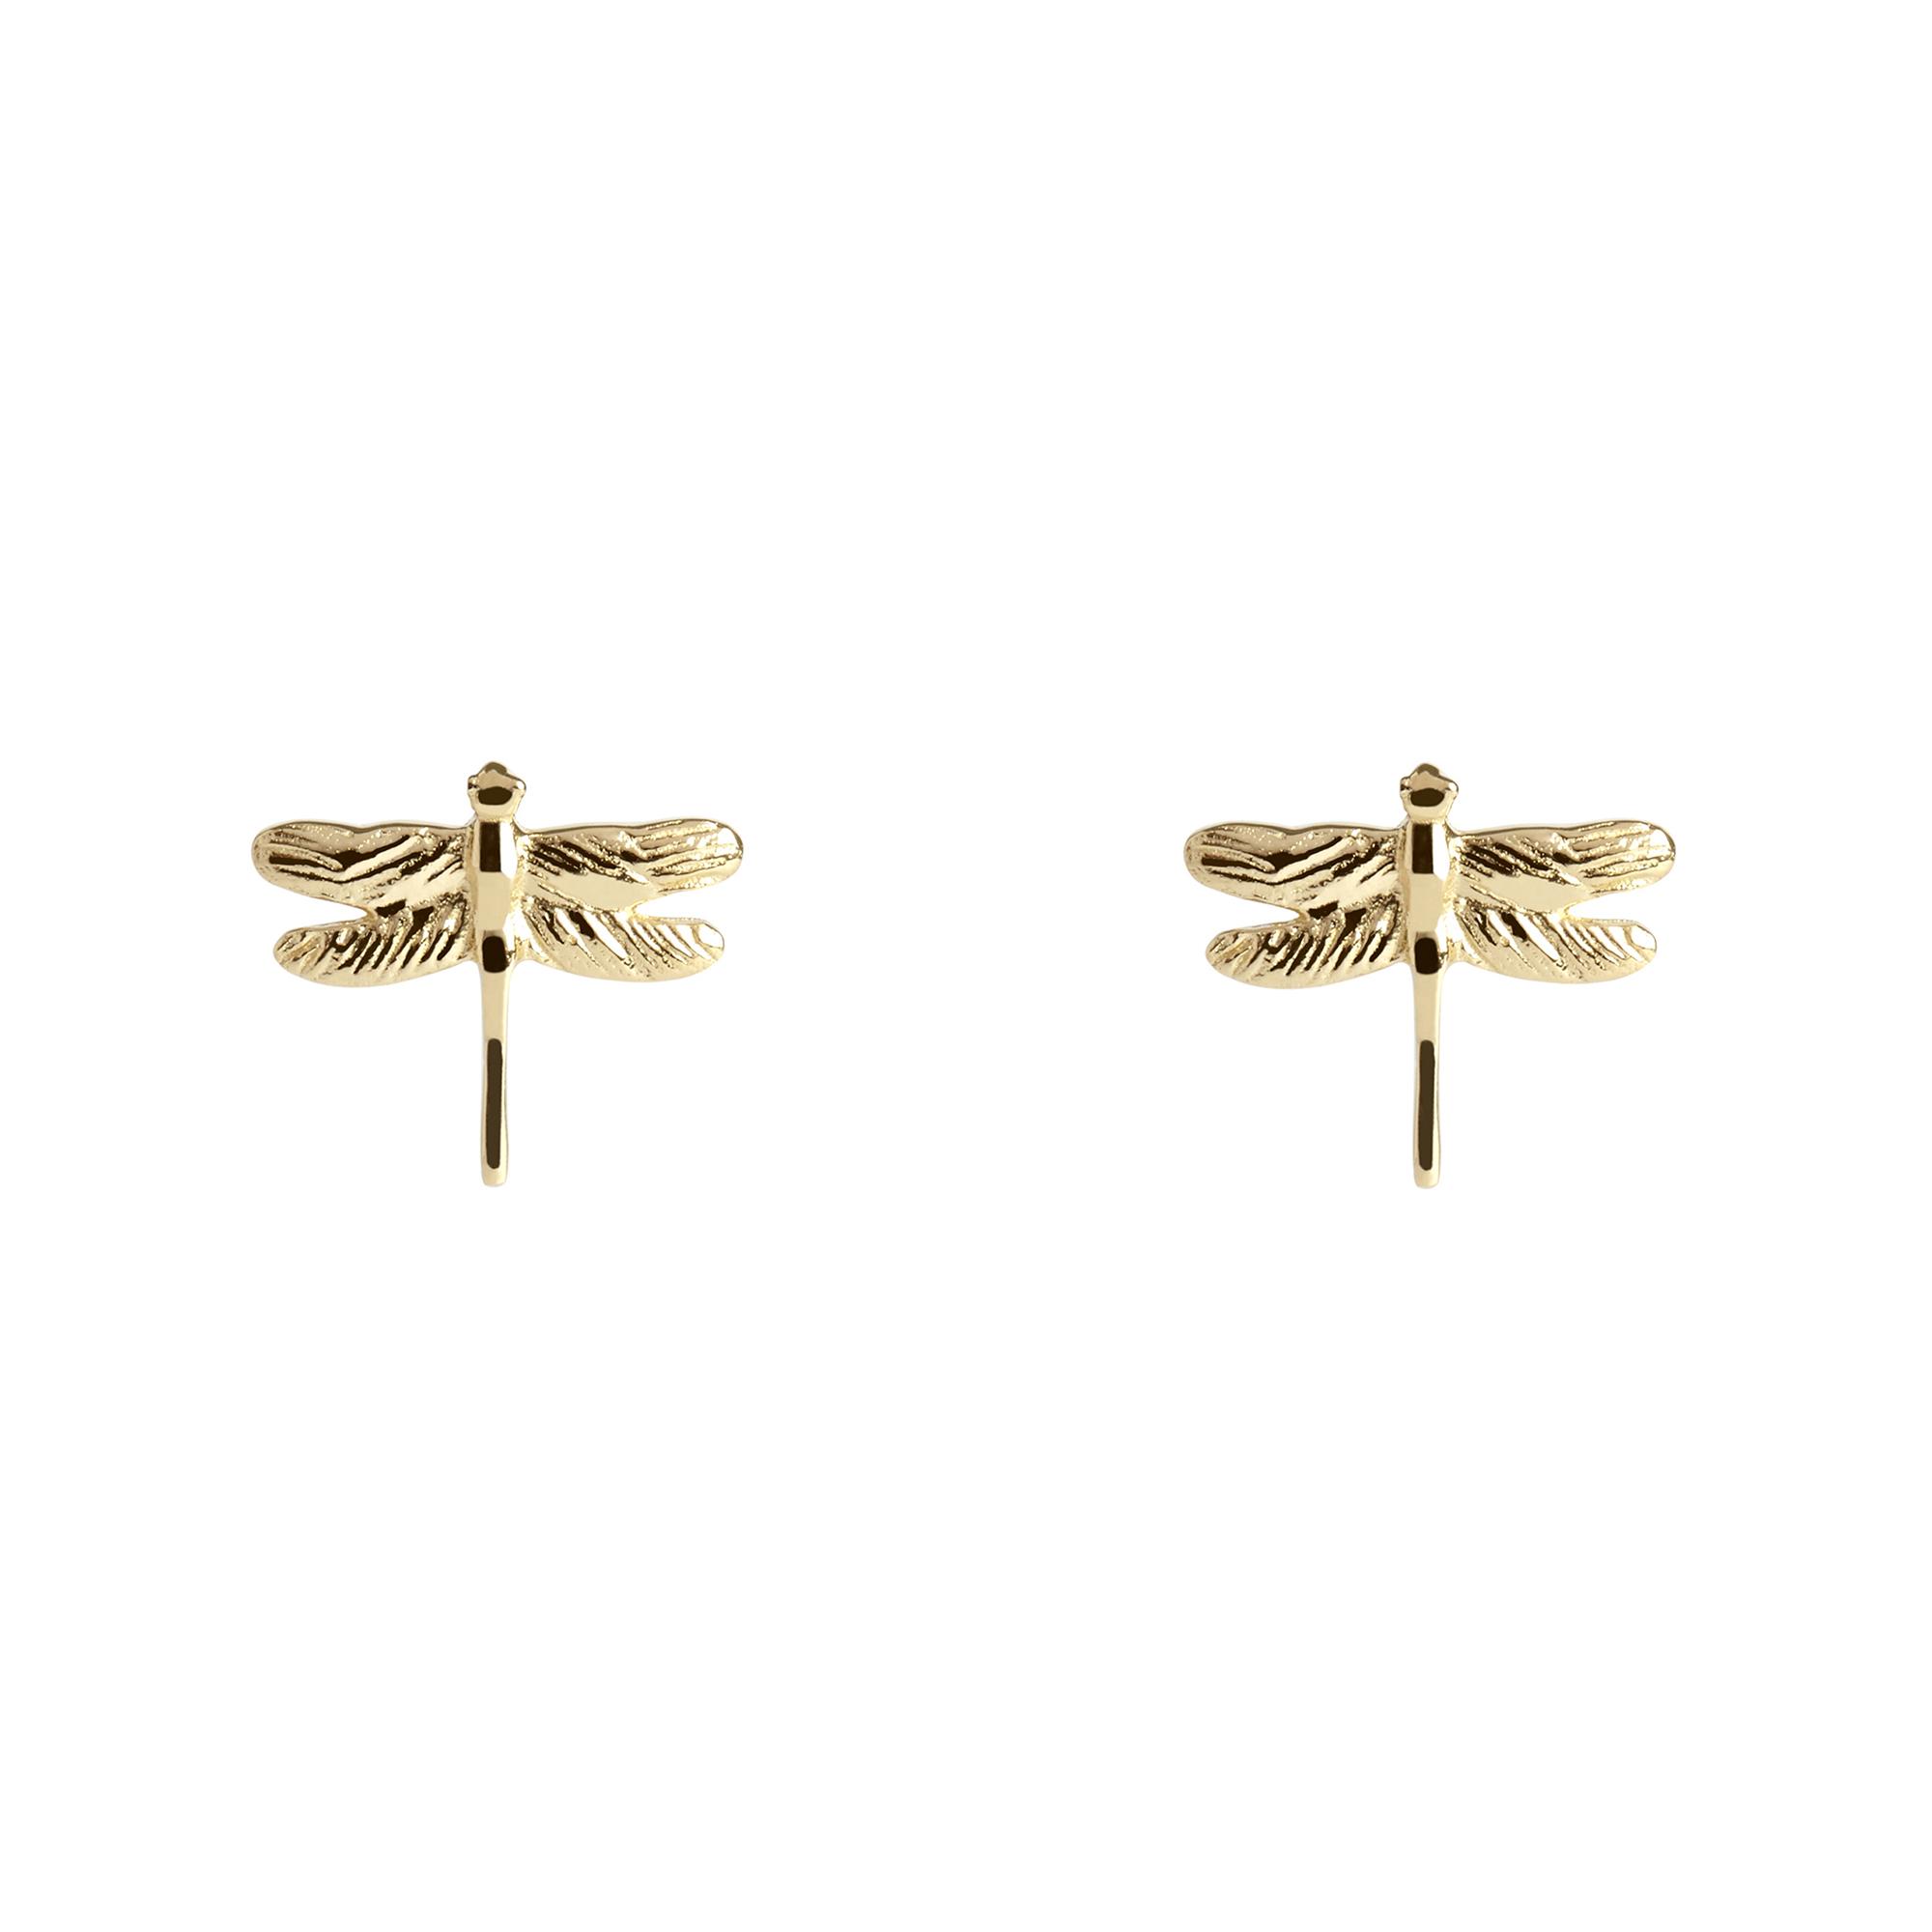 Muru Dragonfly Stud Earrings Gold Plated